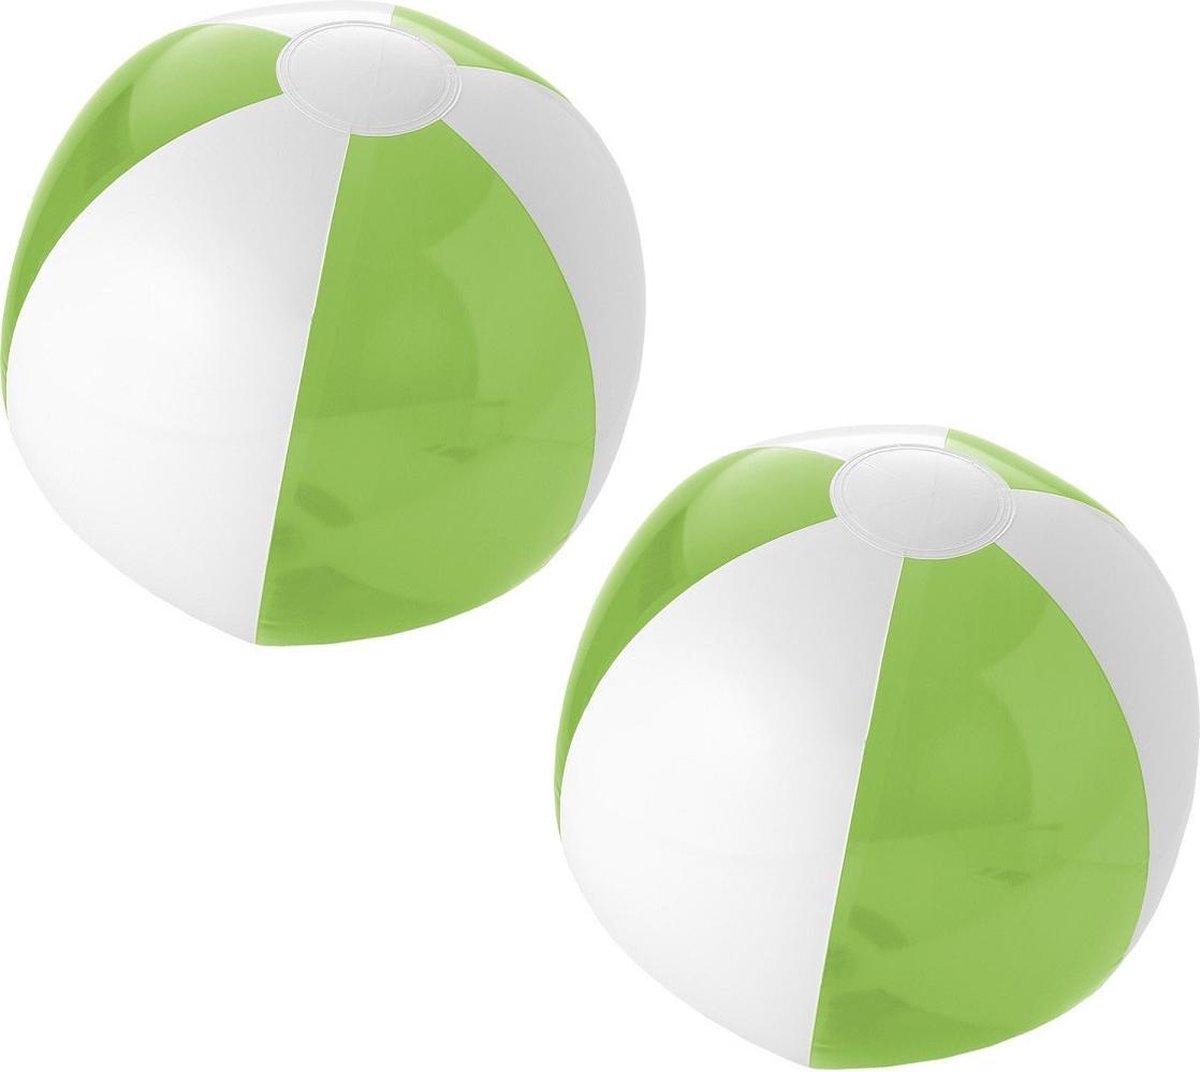 10x stuks opblaasbare strandballen groen/wit 30 cm - Buitenspeelgoed waterspeelgoed opblaasbaar